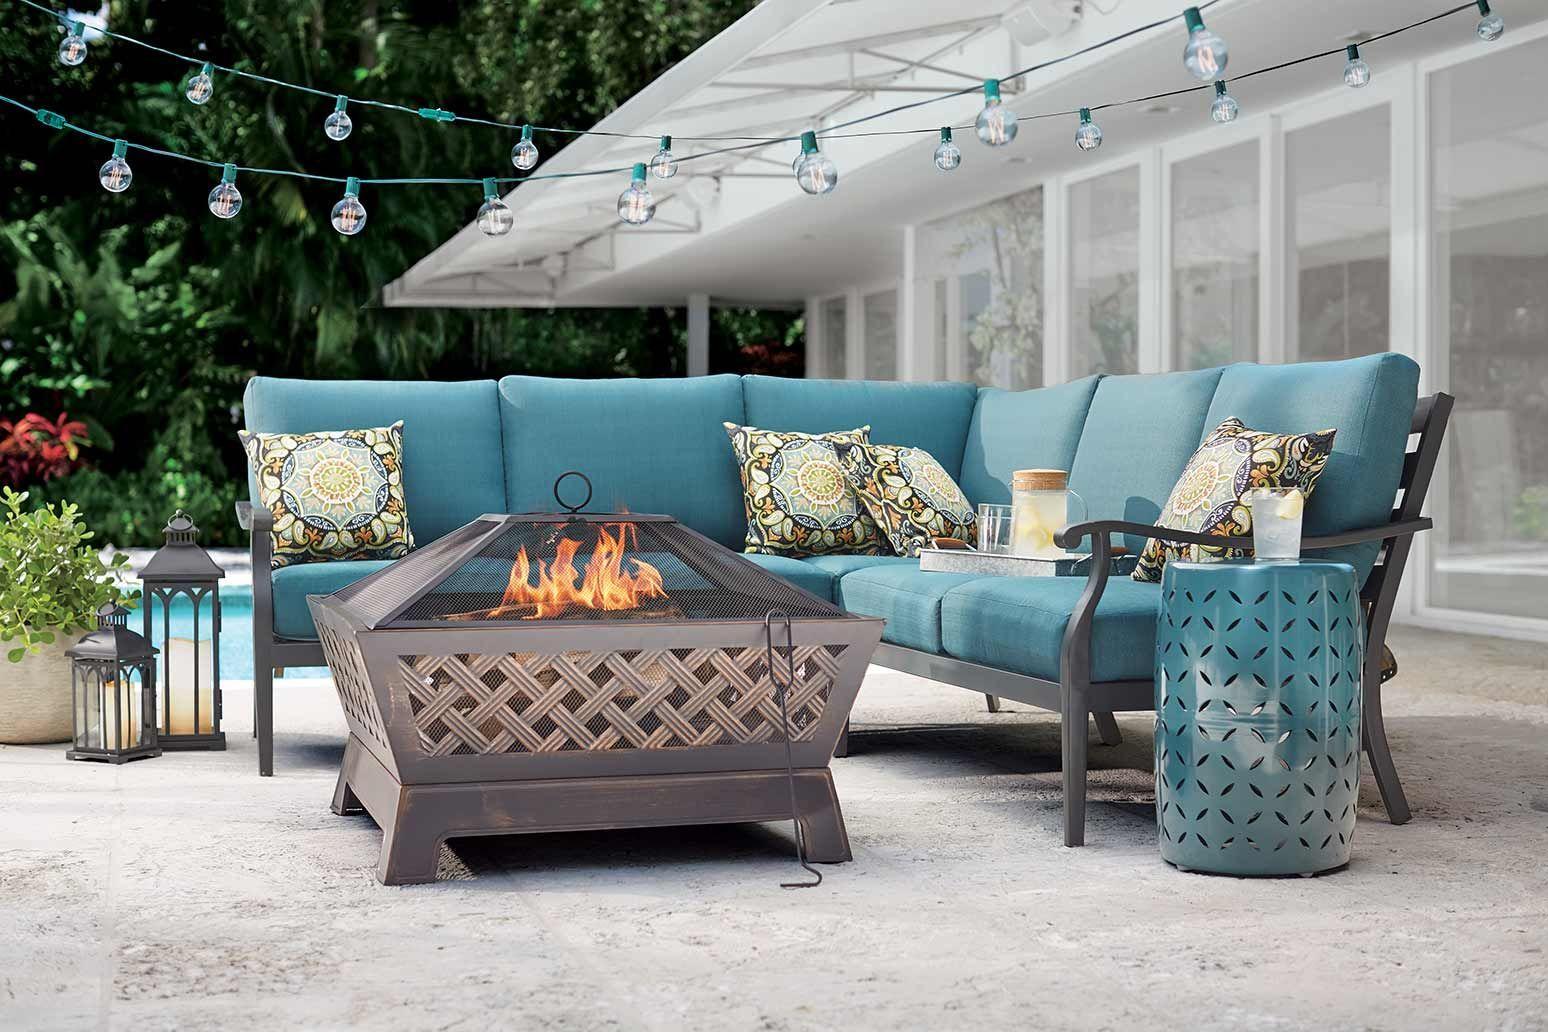 Backyard patio ideas for small yards patio ideas in